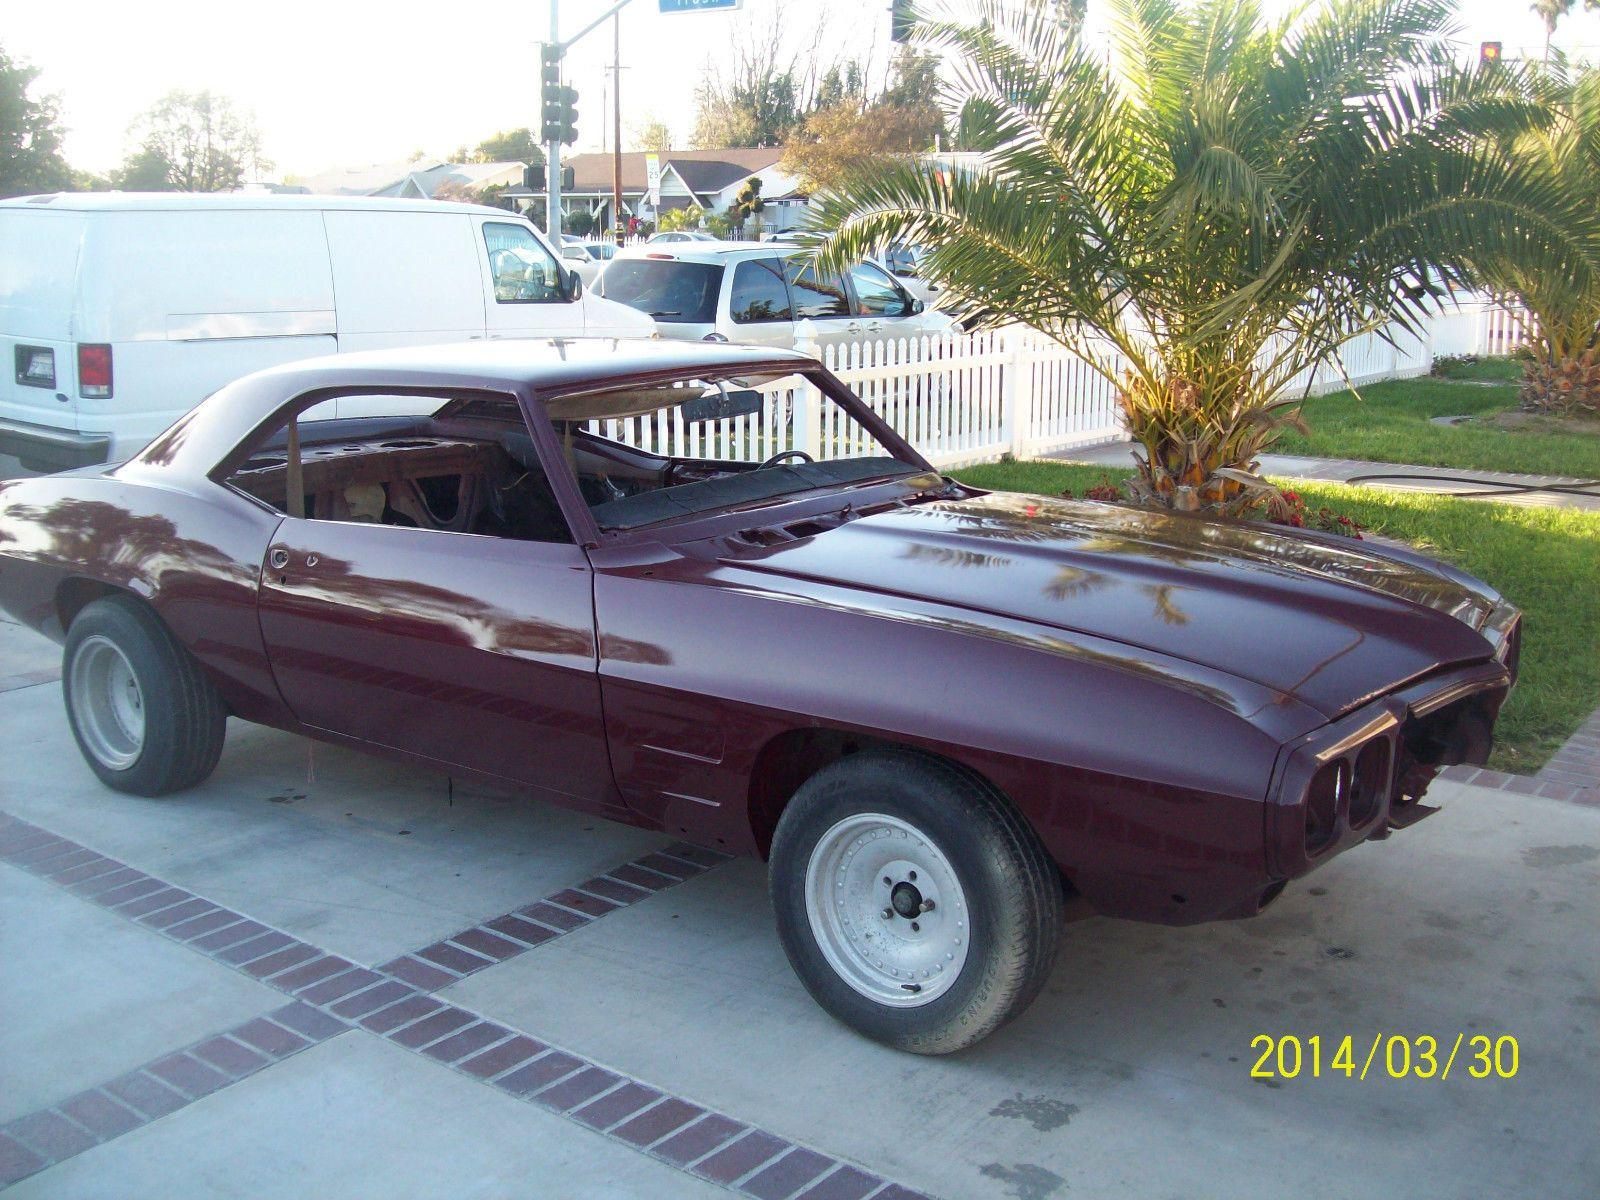 1969 Pontiac Firebird Project Car For Sale | Pontiac Firebird ...